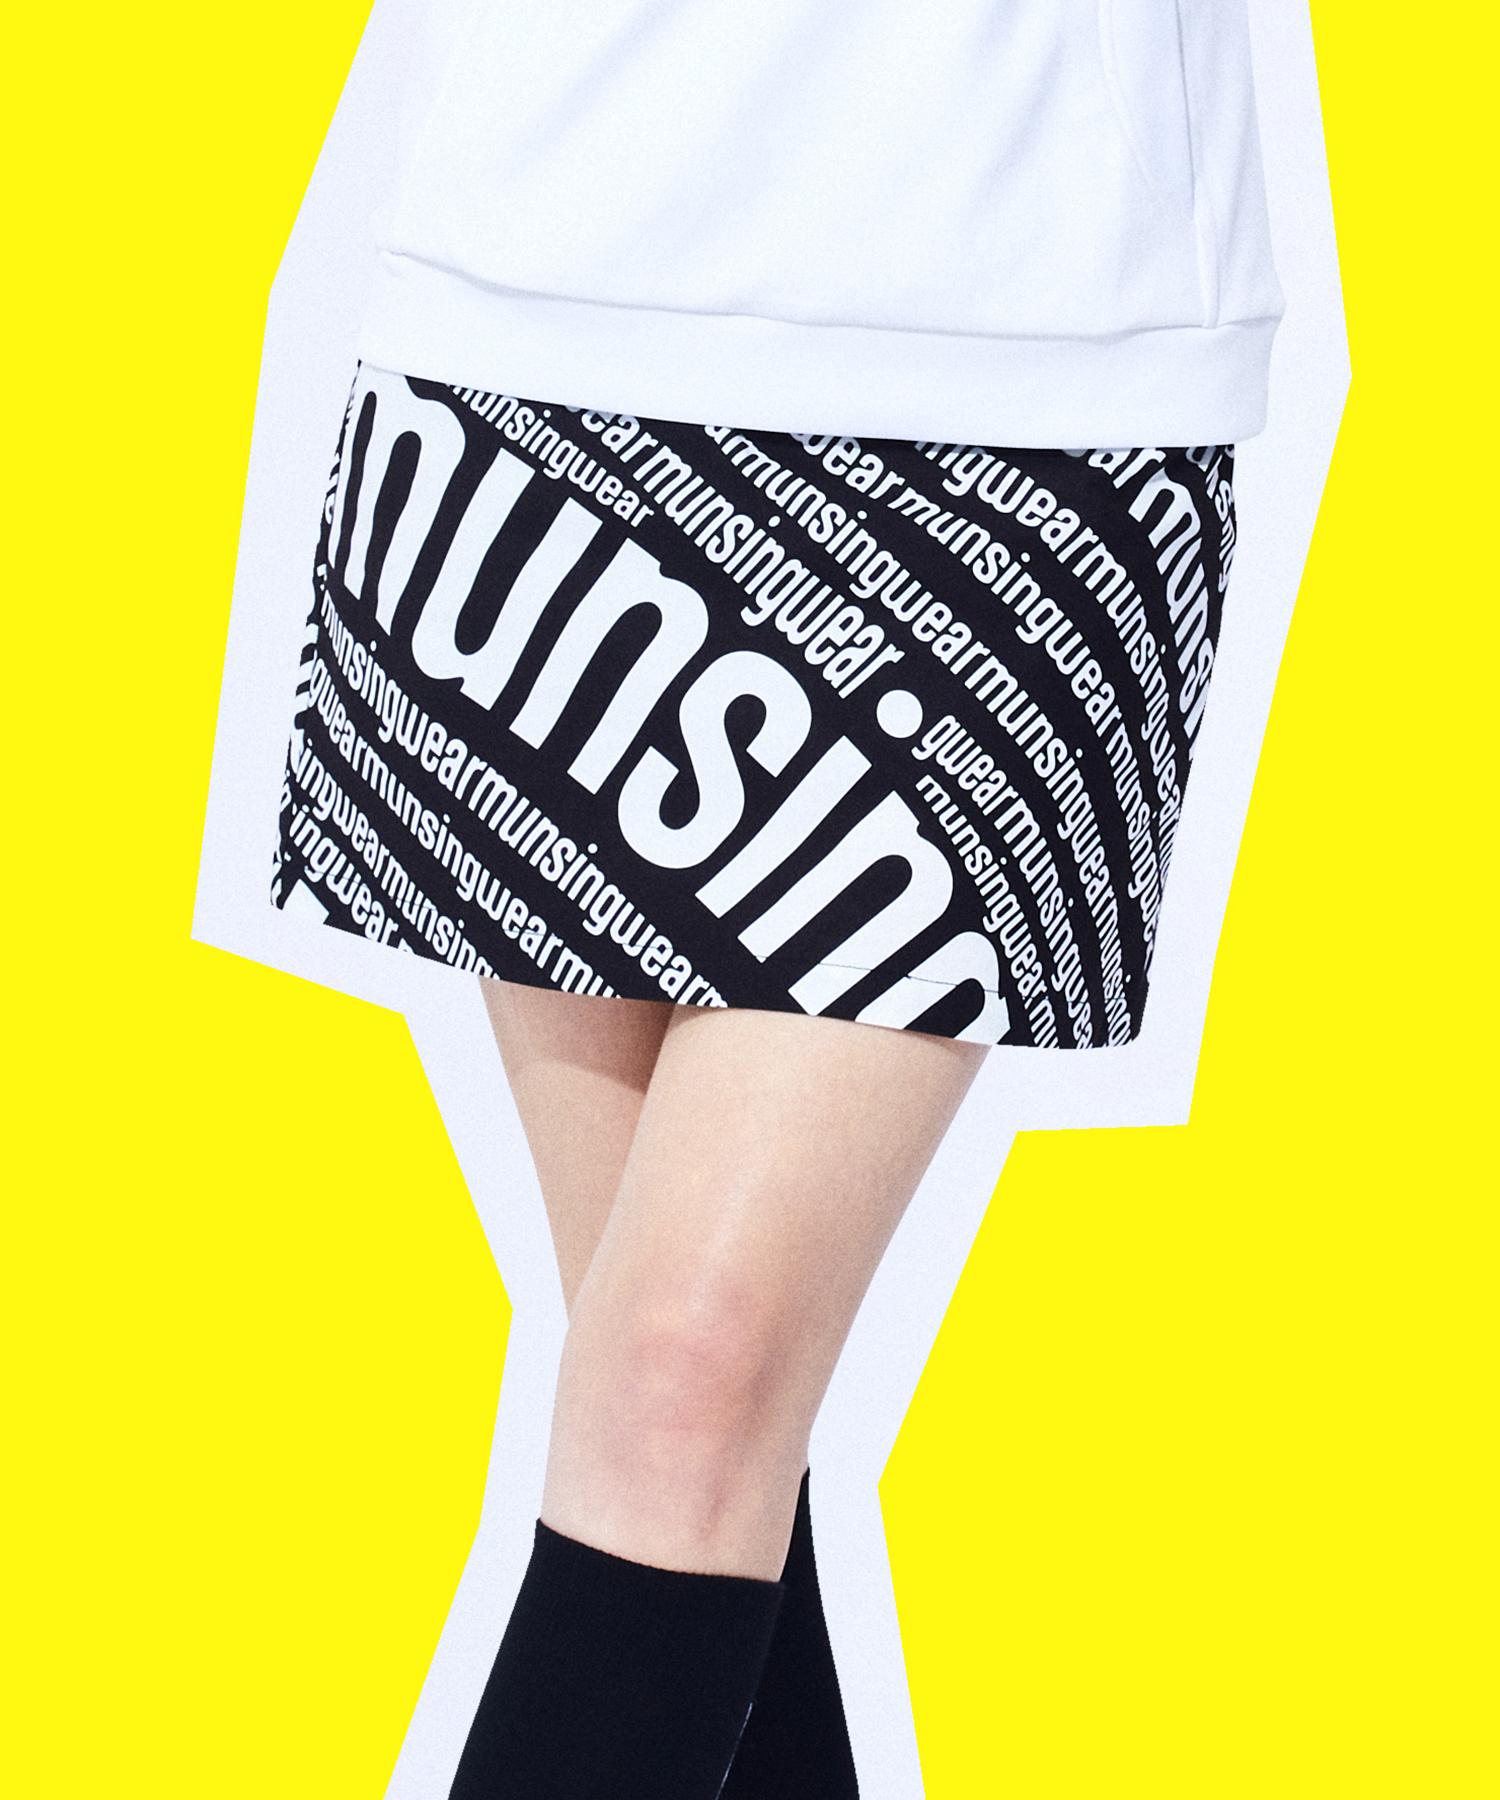 【ENVOY】ストレッチロゴプリントスカート(インパンツ付/38cm丈)